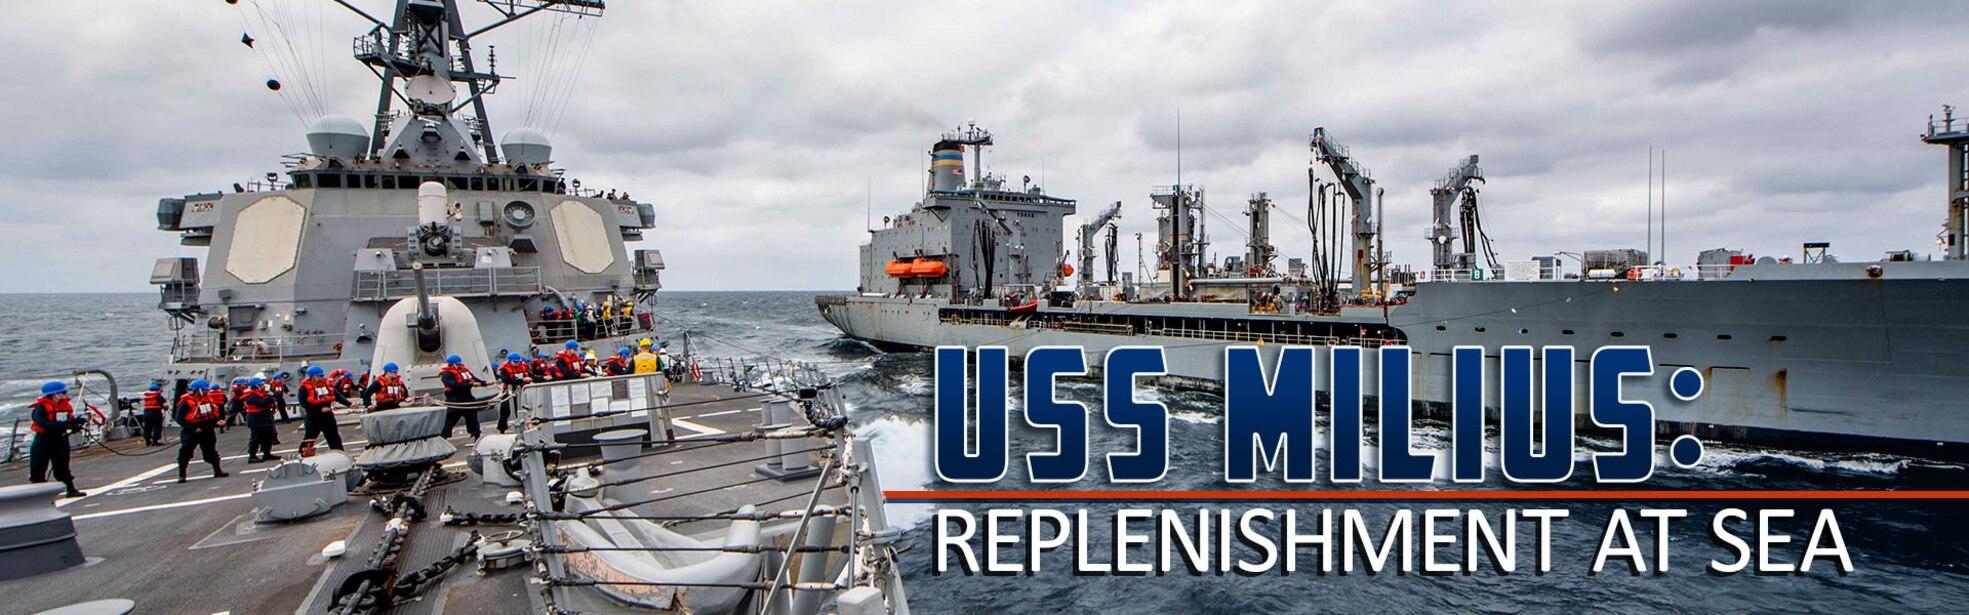 USS Milius: Replenishment at Sea written in front of a replenishment at sea.